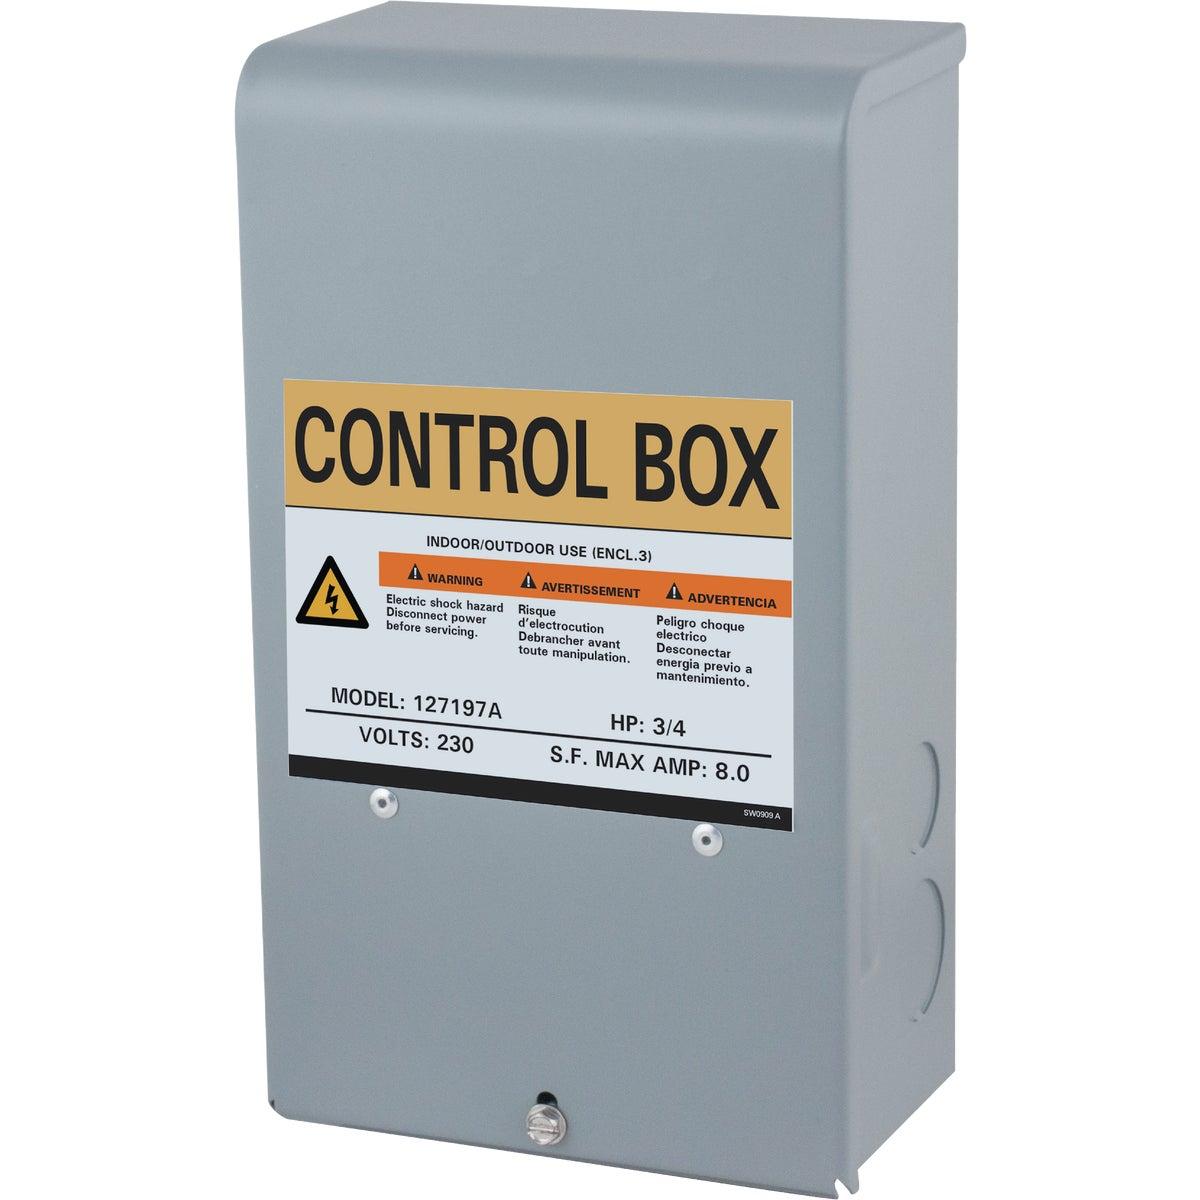 Flint Walling/Star 3/4HP 230V CONTROL 127197